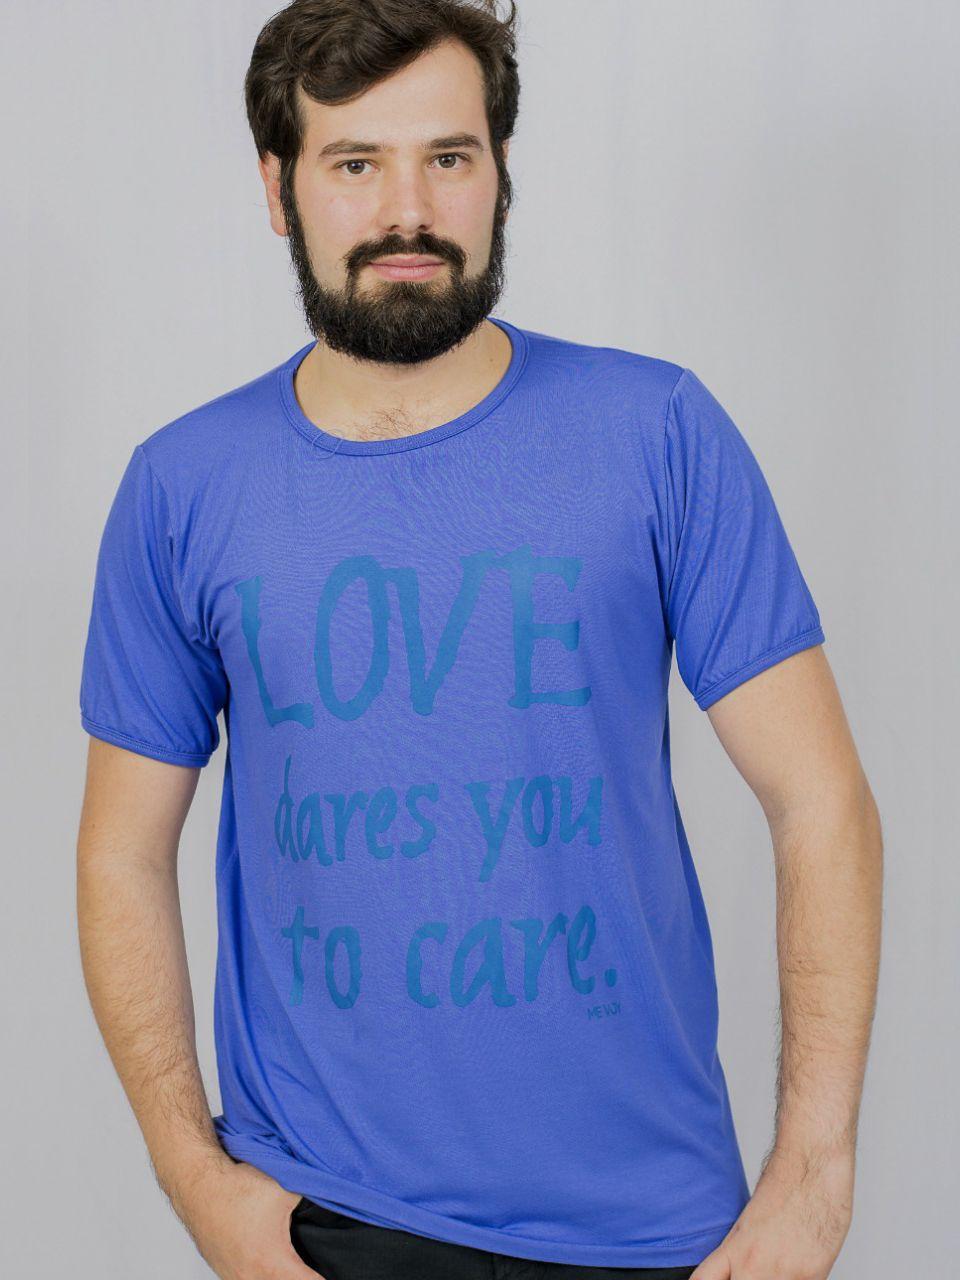 Manga Curta Masculina - Love dares You to care